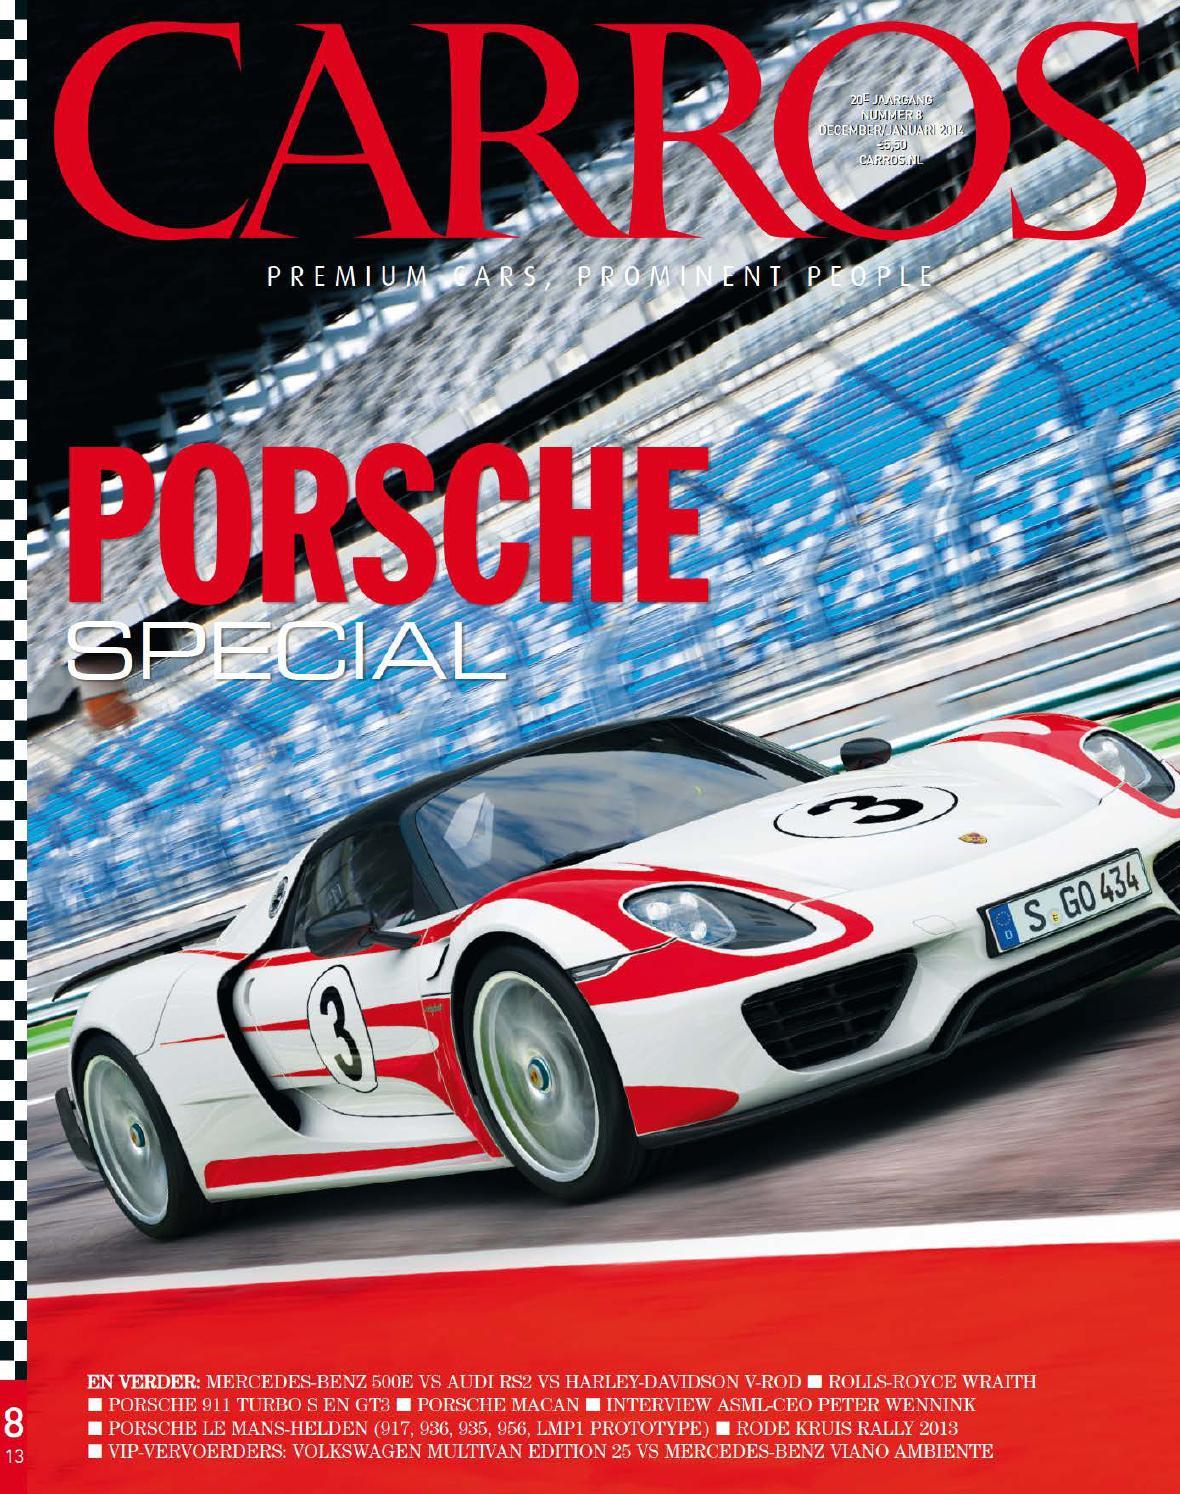 Carros Porsche Special by Pelican Media - issuu